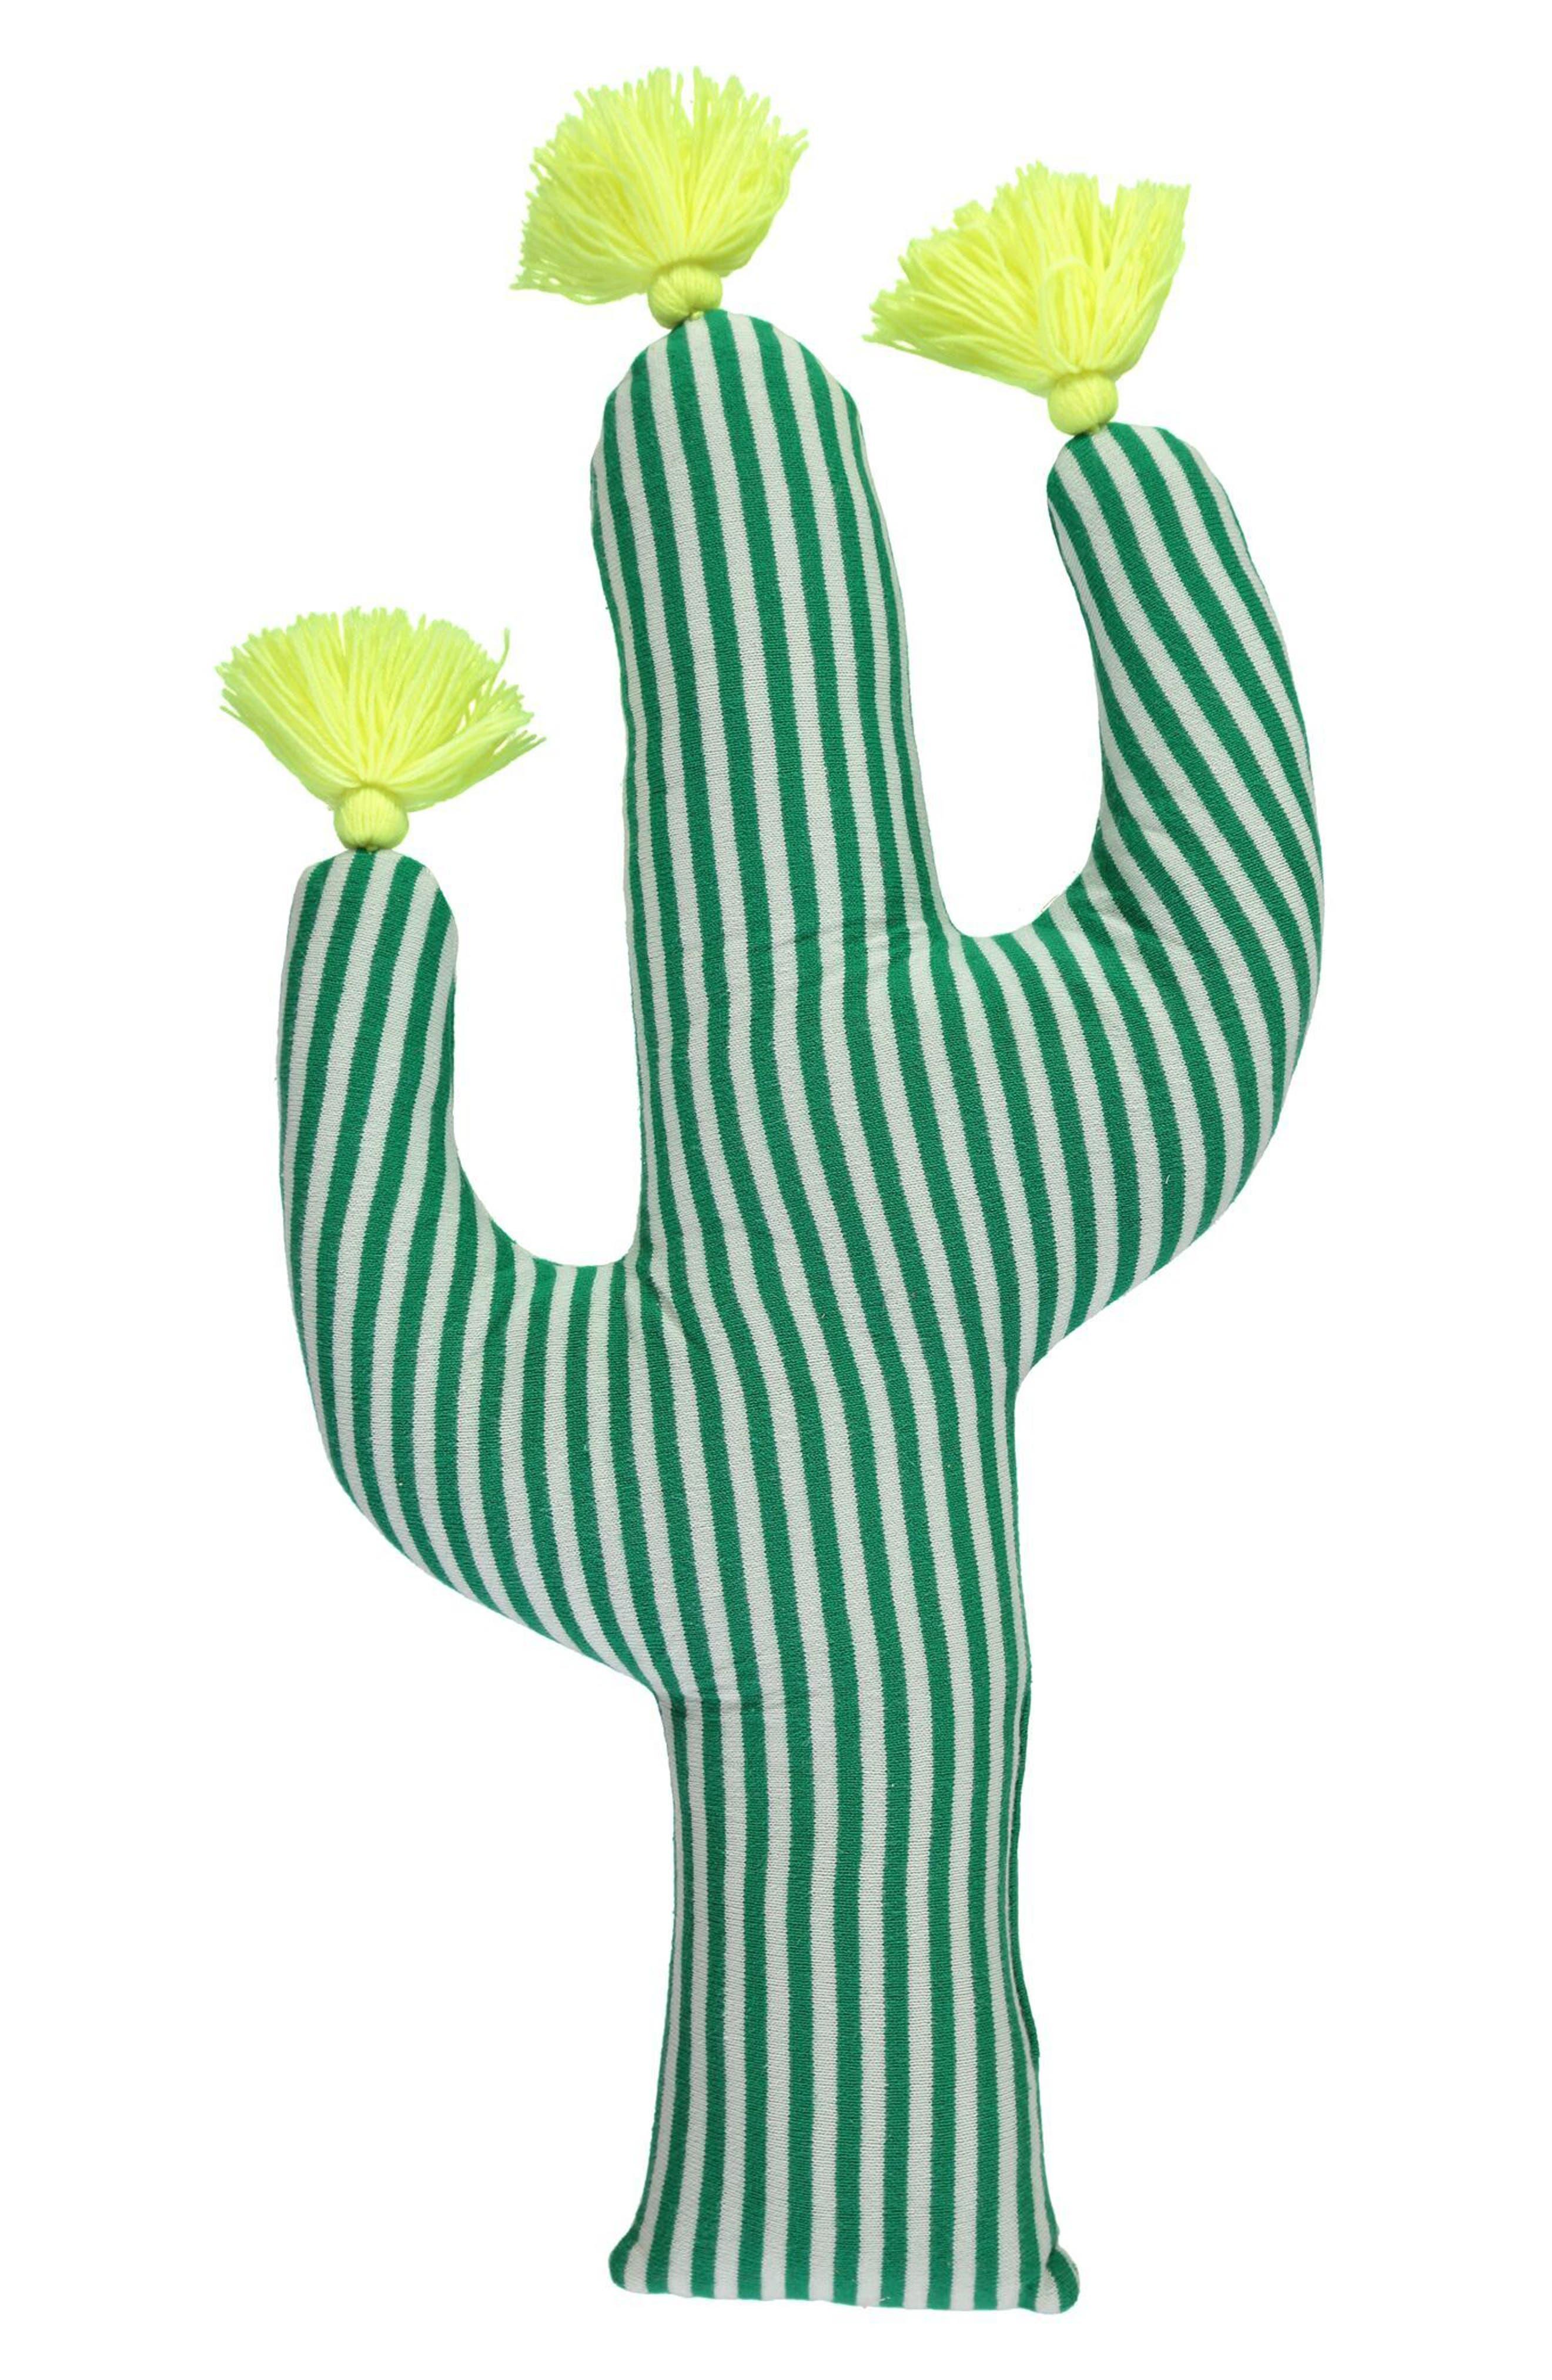 Knit Organic Cotton Cactus Cushion,                             Main thumbnail 1, color,                             Green